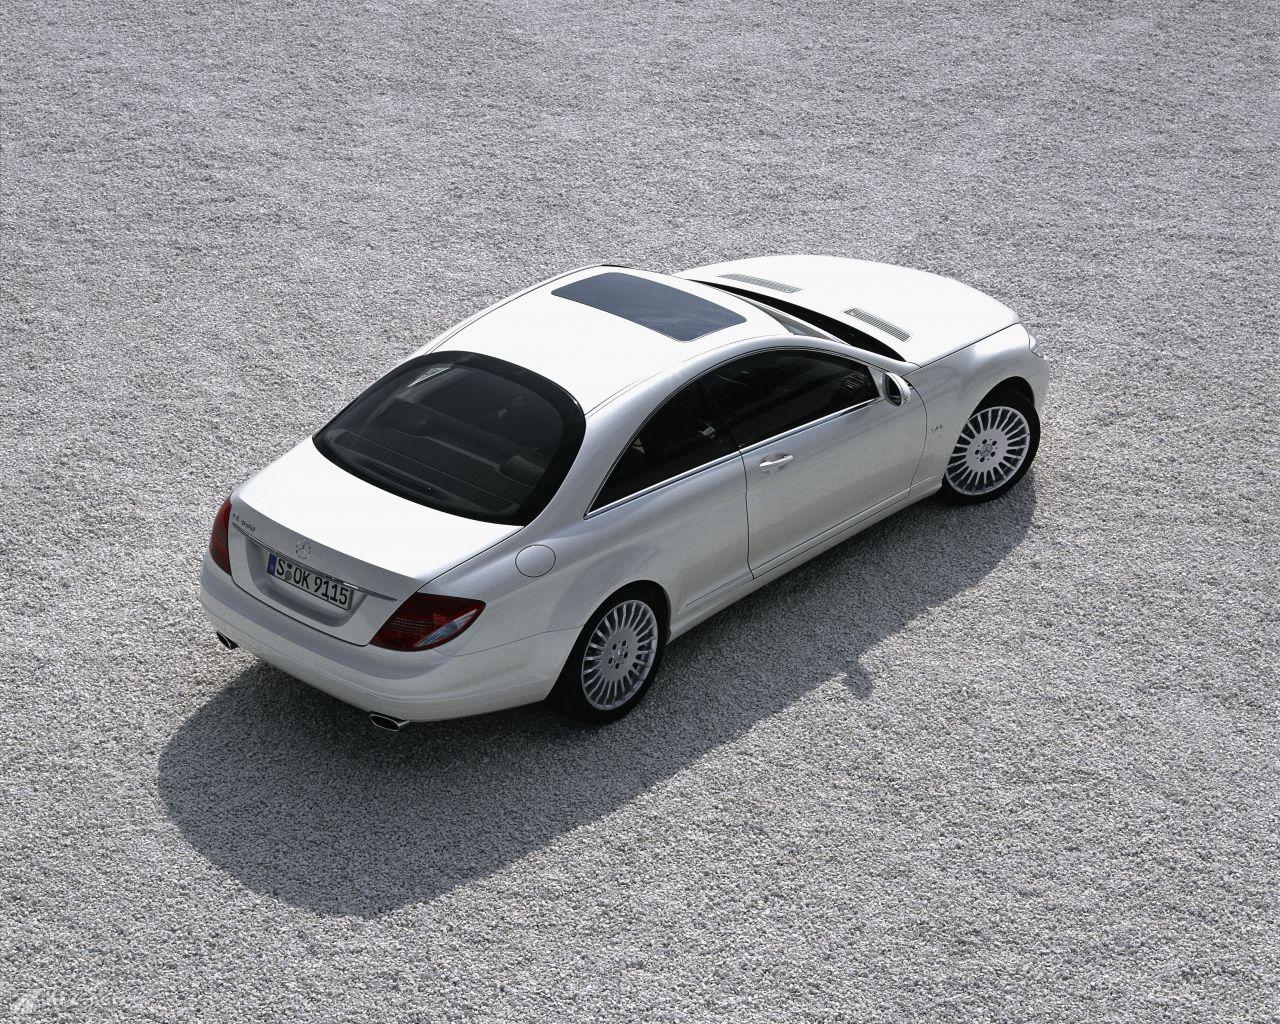 mercedes-cl-klasse-1280x1024-9